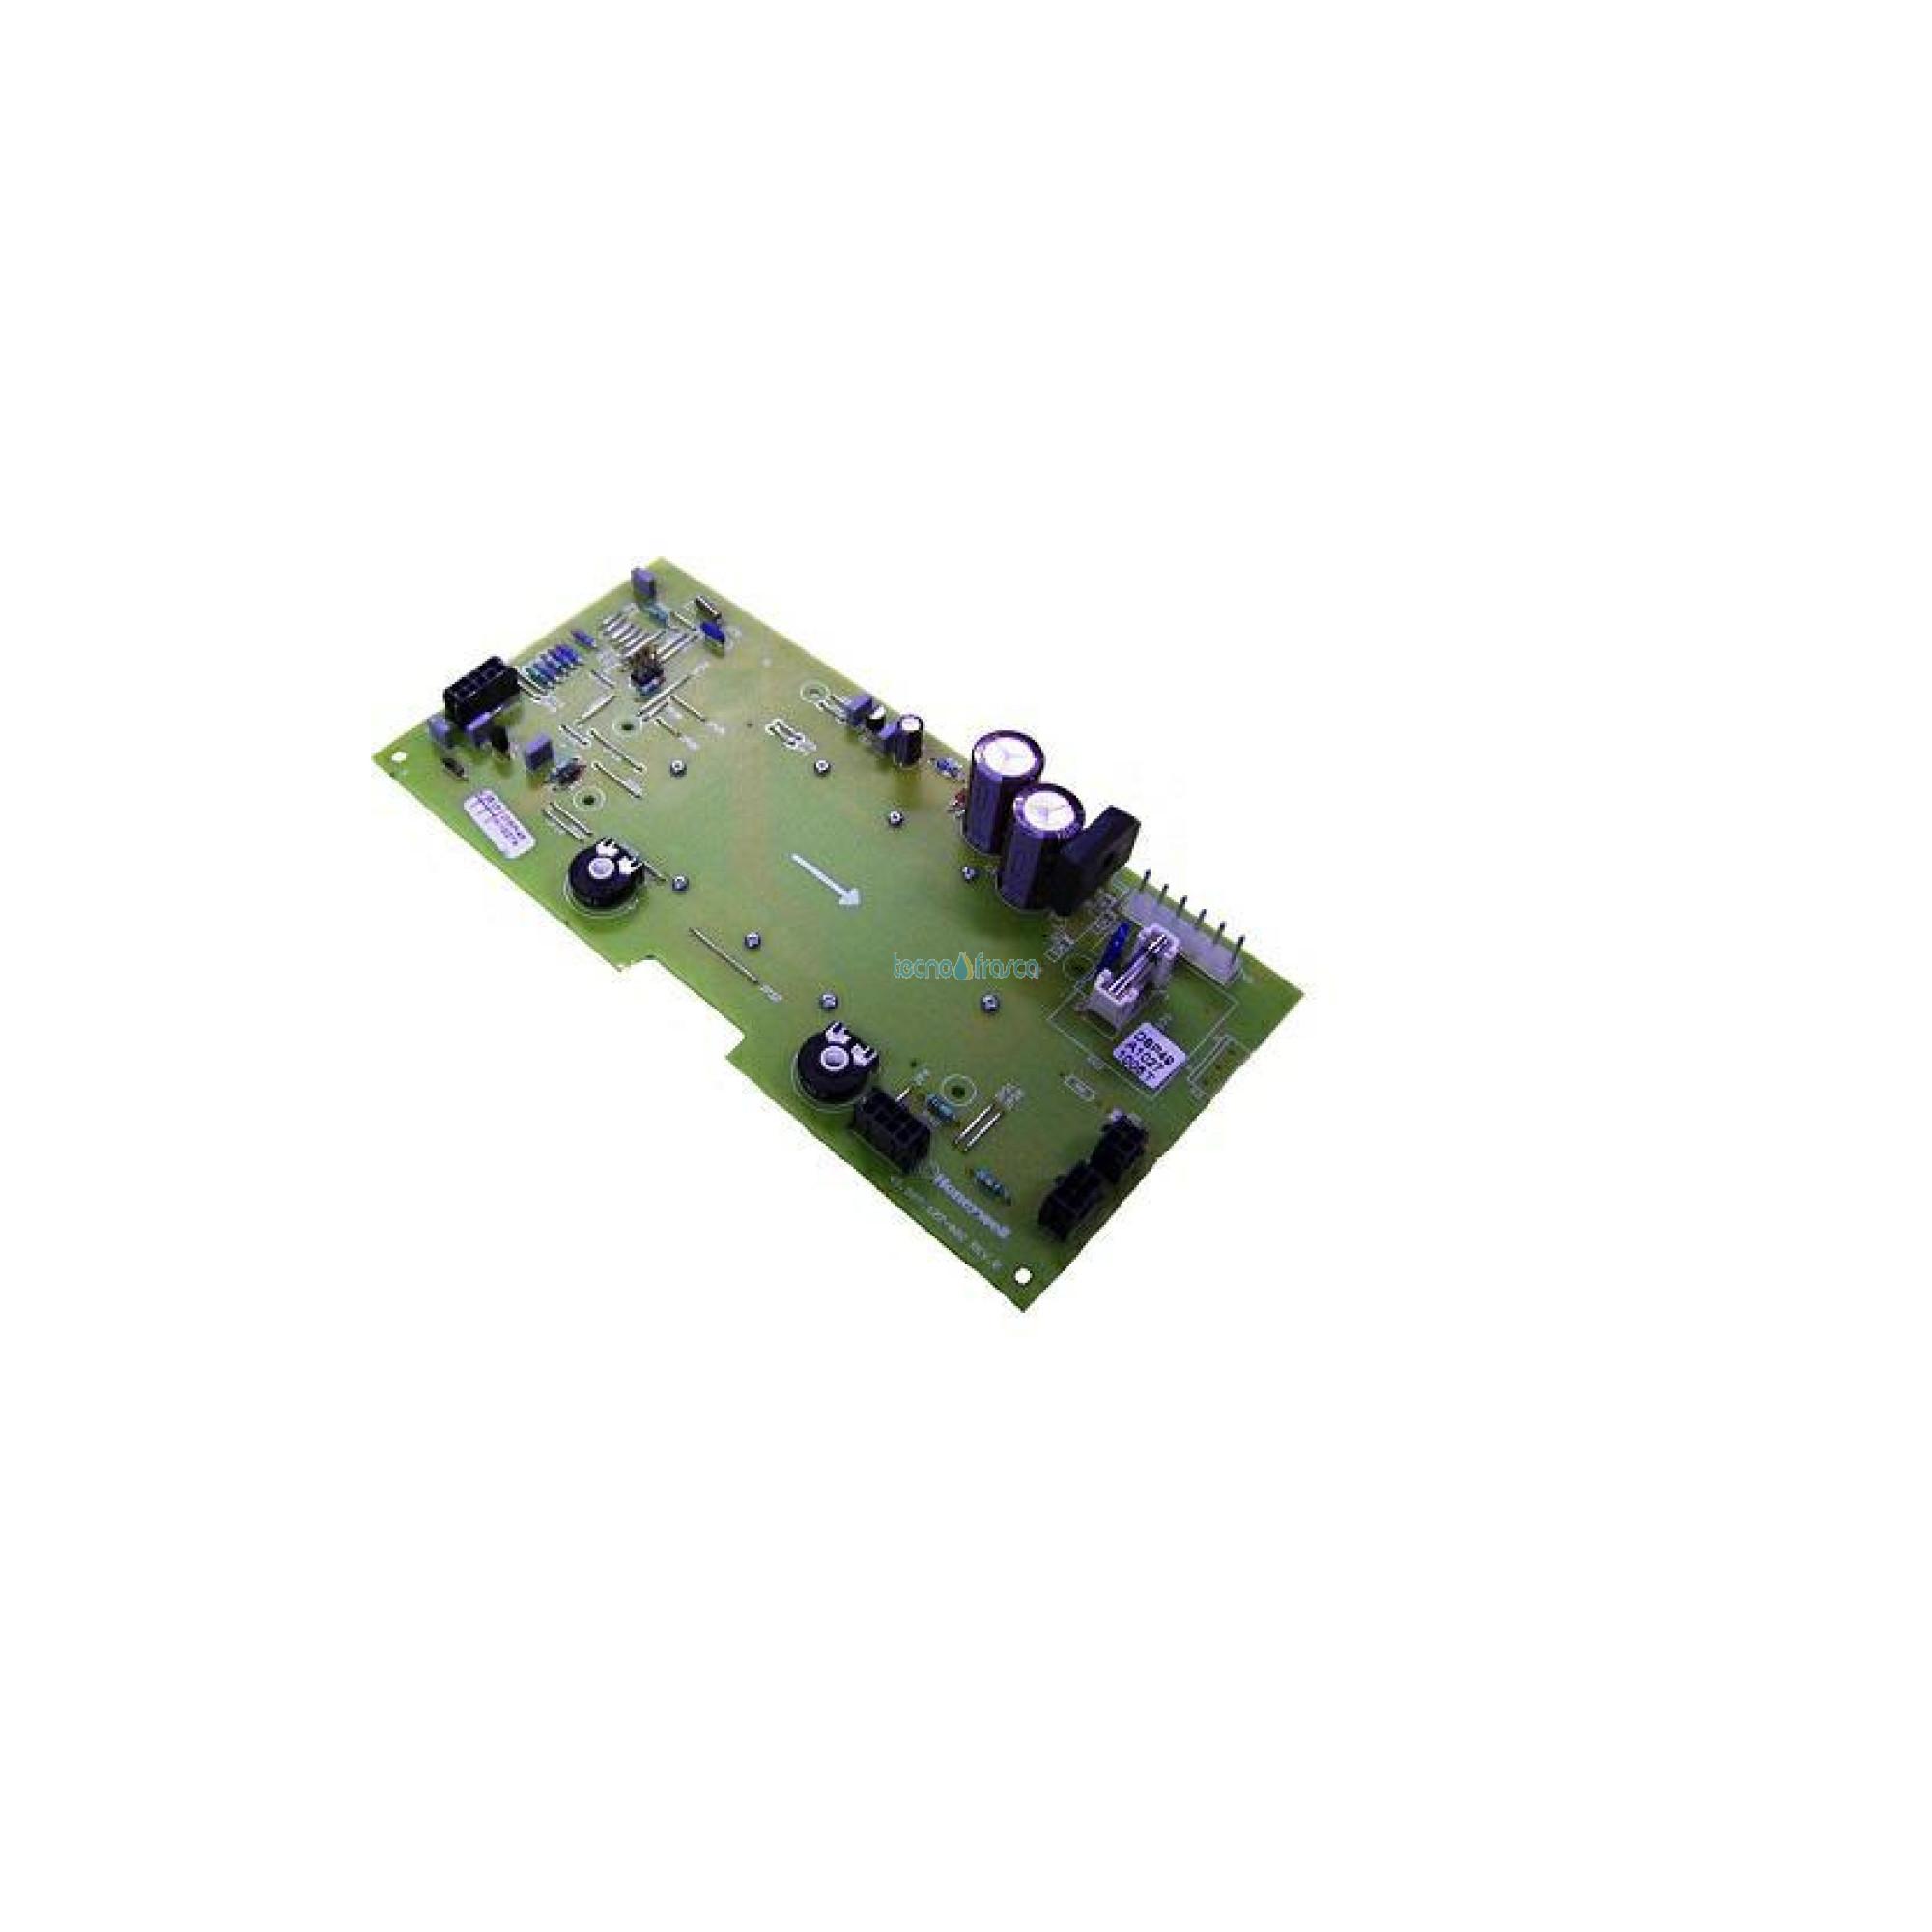 Ferroli kit scheda display econcept 39810380